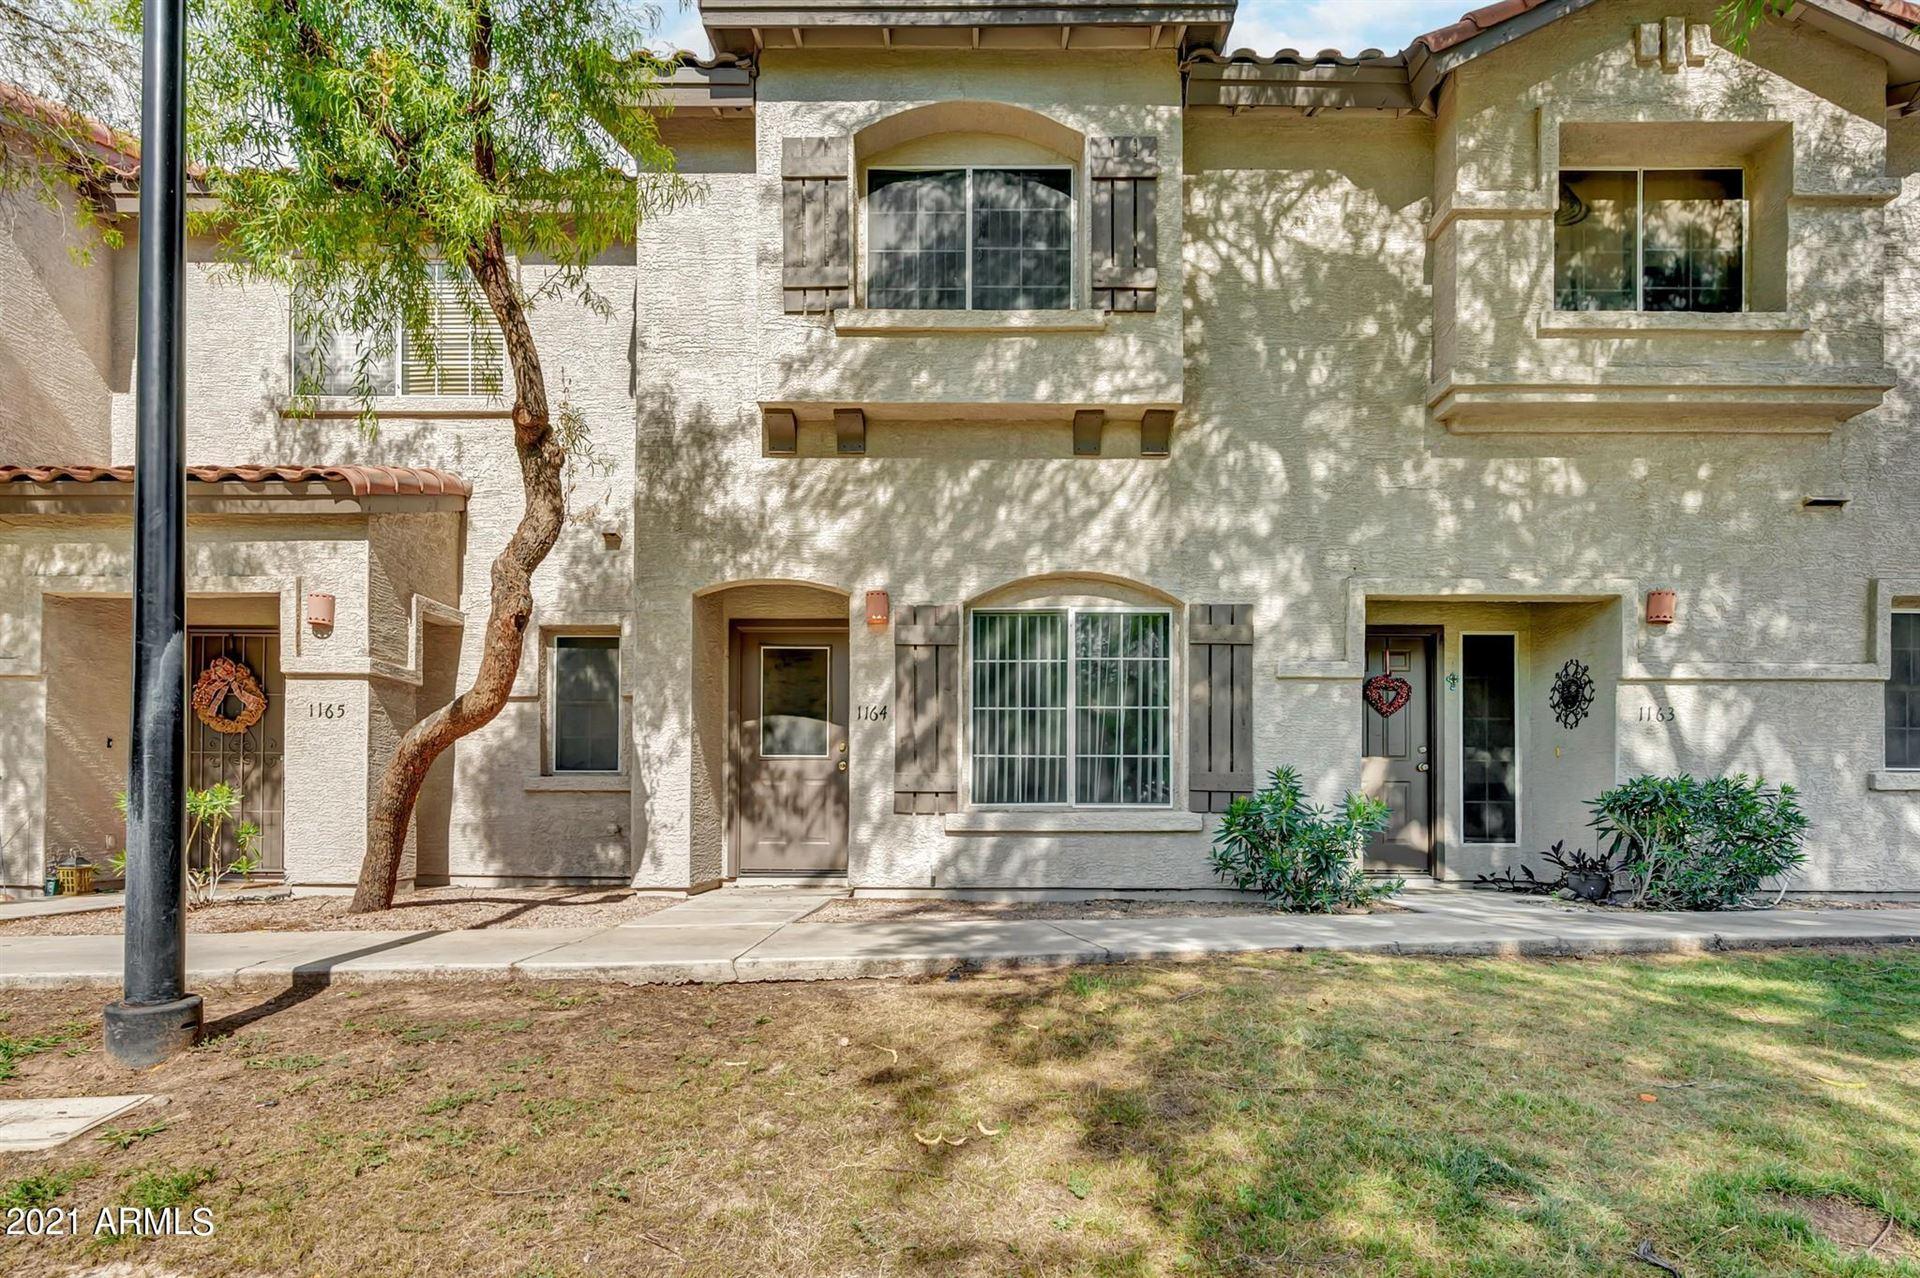 Photo of 1961 N HARTFORD Street #1164, Chandler, AZ 85225 (MLS # 6272462)